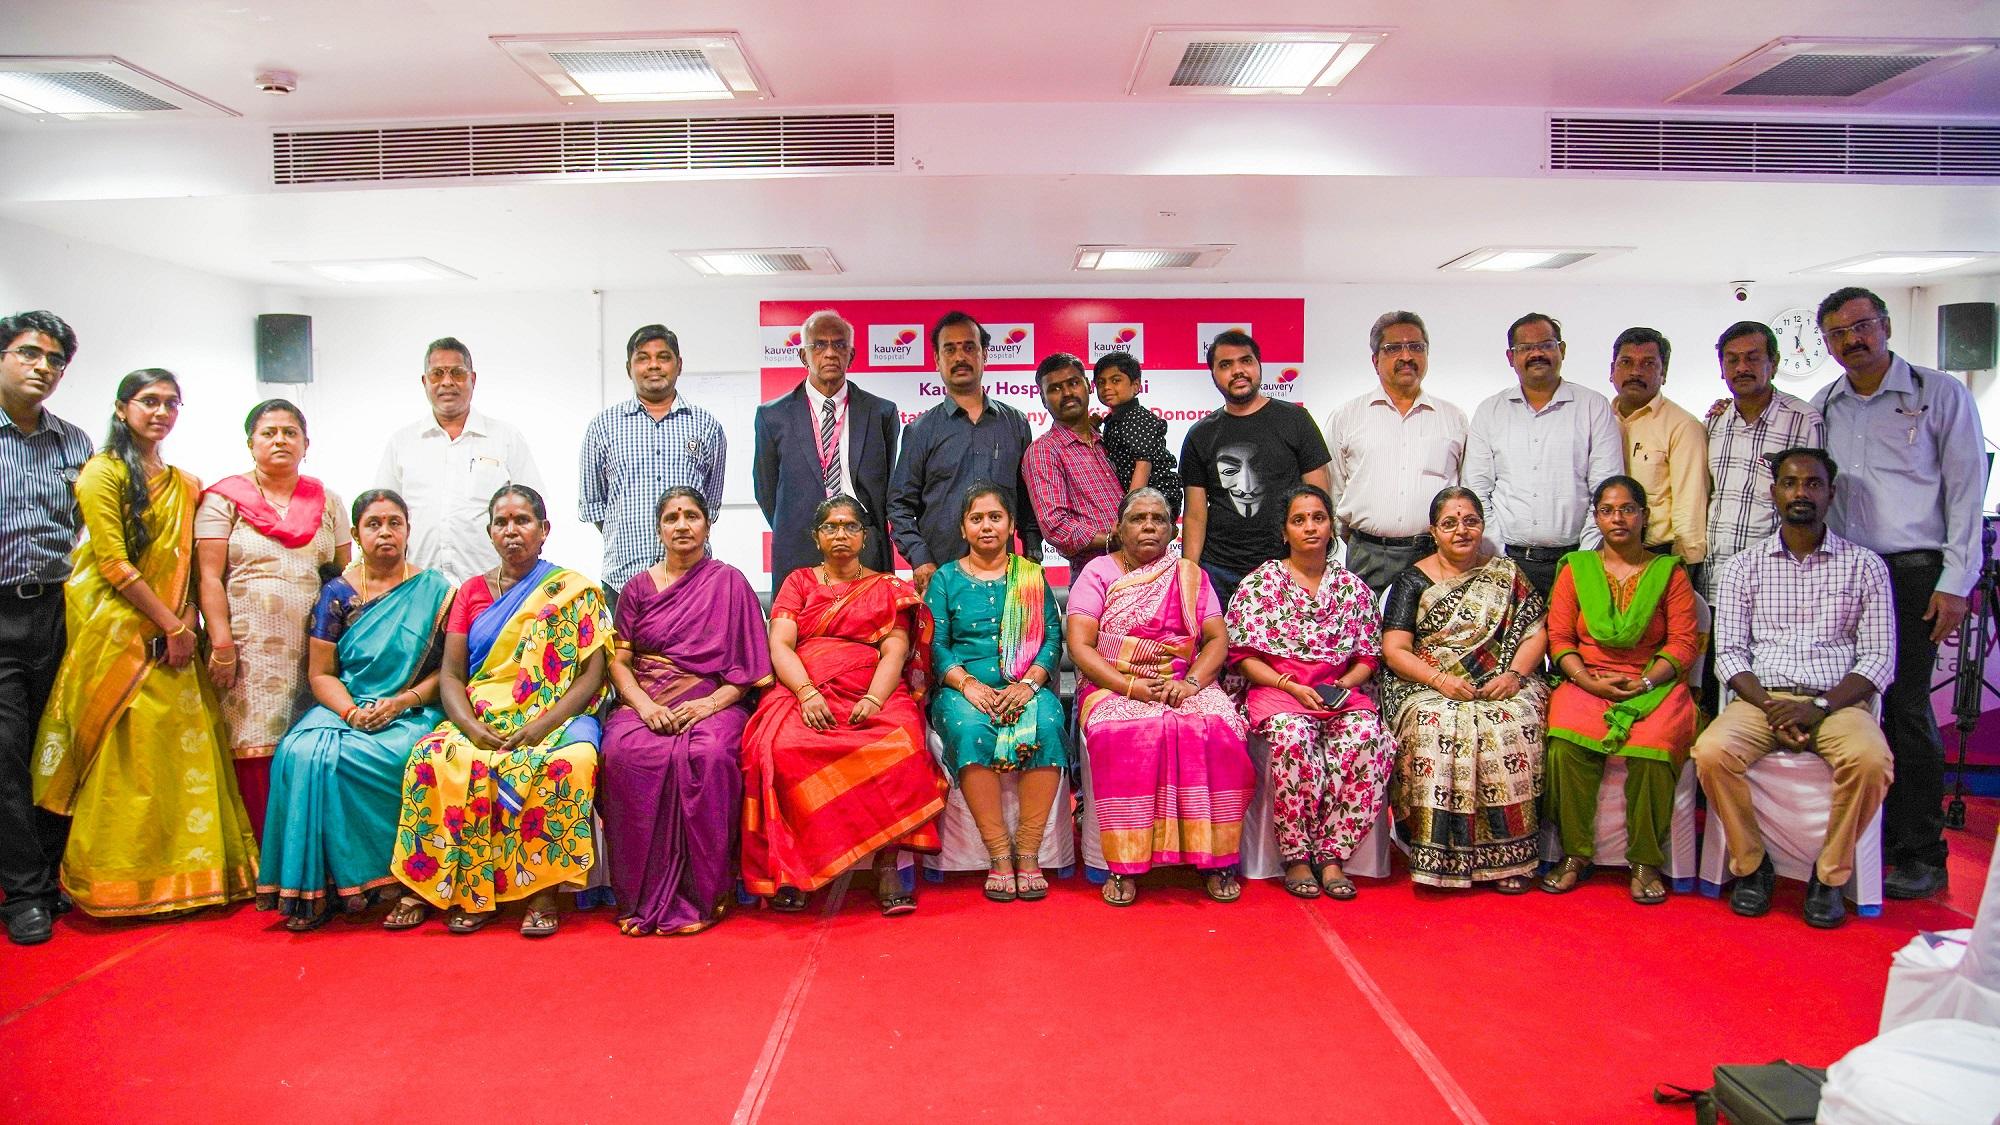 Kauvery Hospital - World Kidney Day Felicitation Ceremony - 04